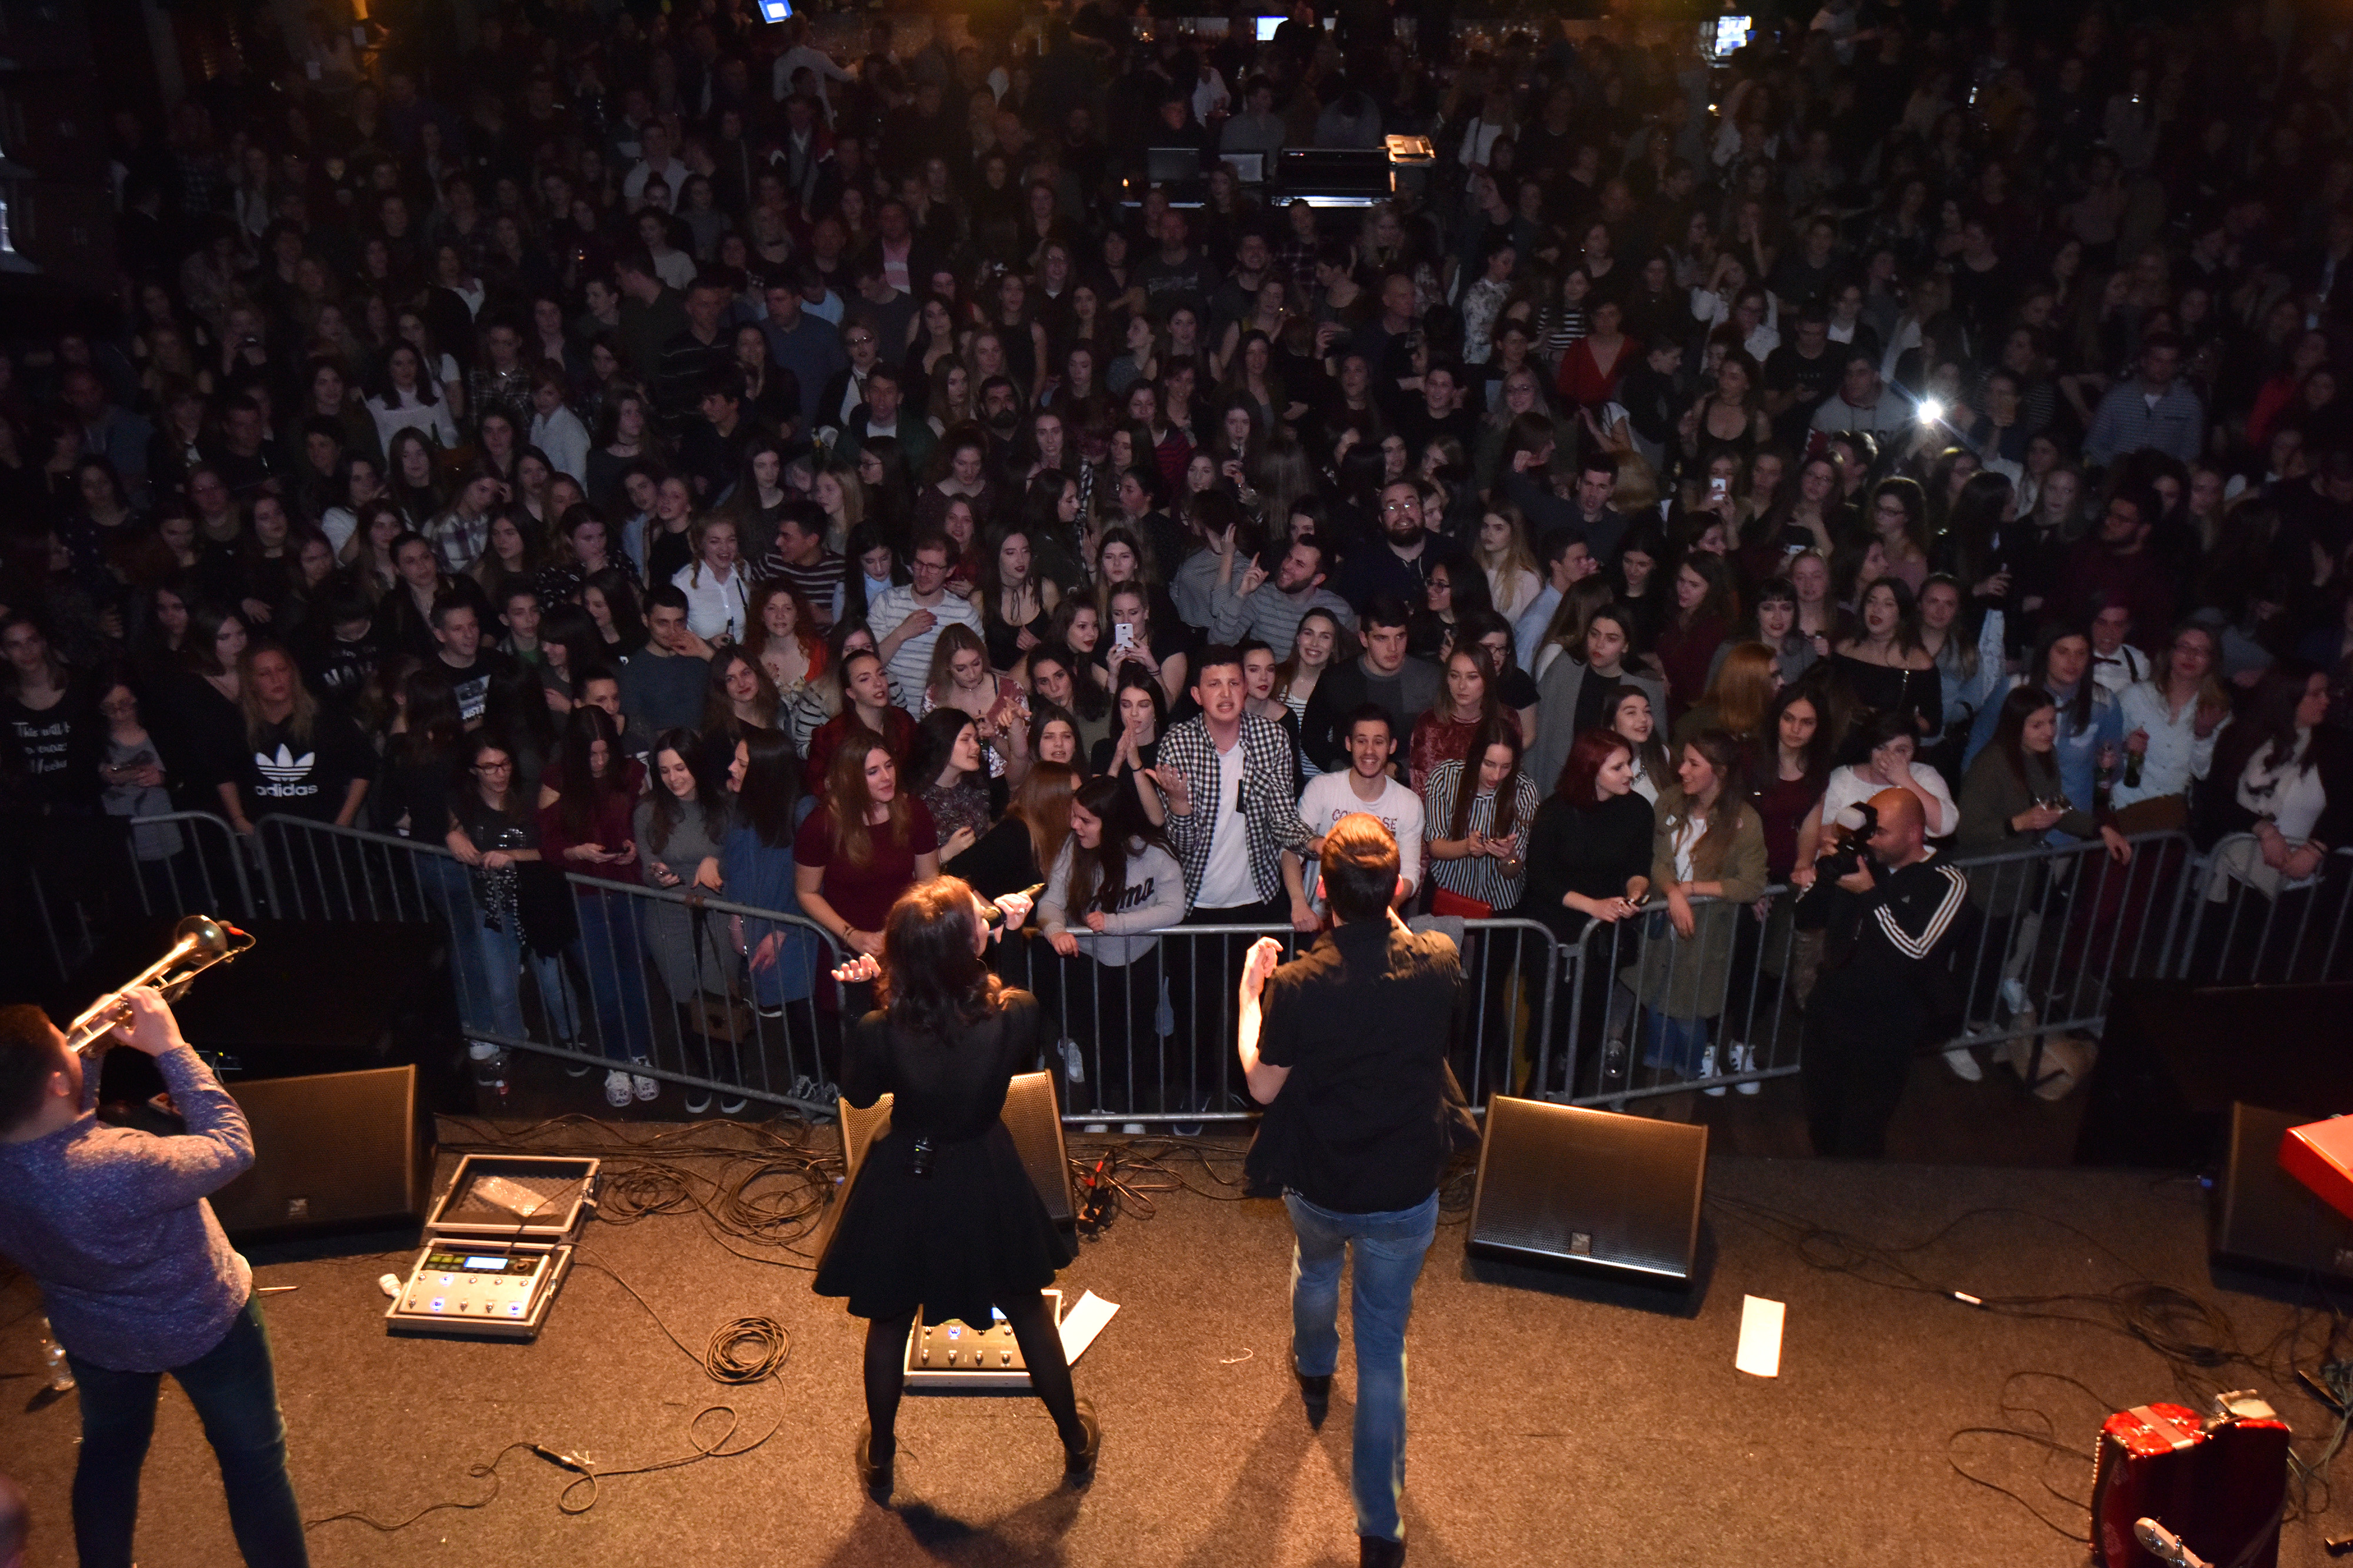 10.02.2017., Zadar -   Grupa S.A.R.S. odrzala je koncert u Arsenalu.  Photo: Dino Stanin/PIXSELL